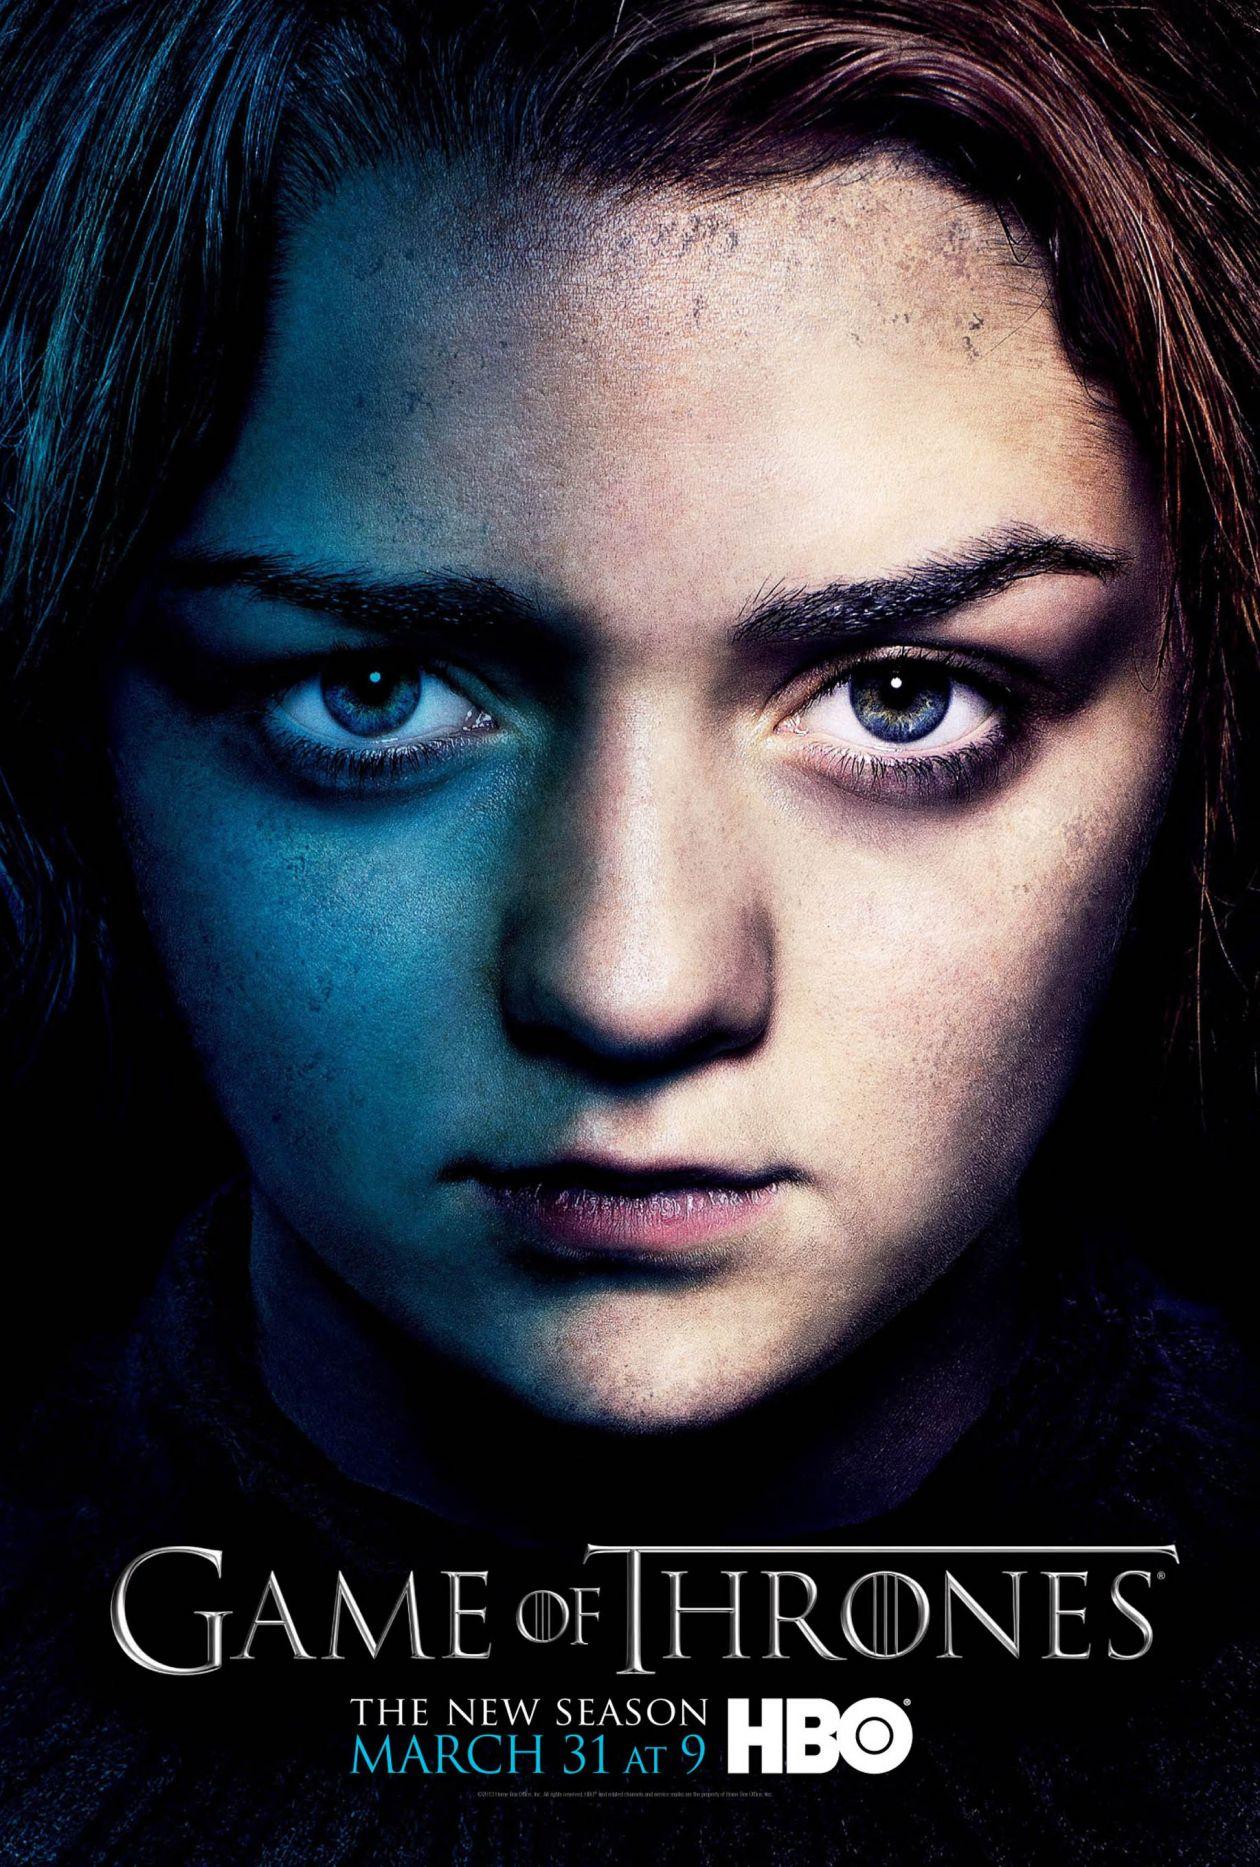 Maisie Williams actress : Arya Stark  Game of Thrones : Series Poster Season 3 2013